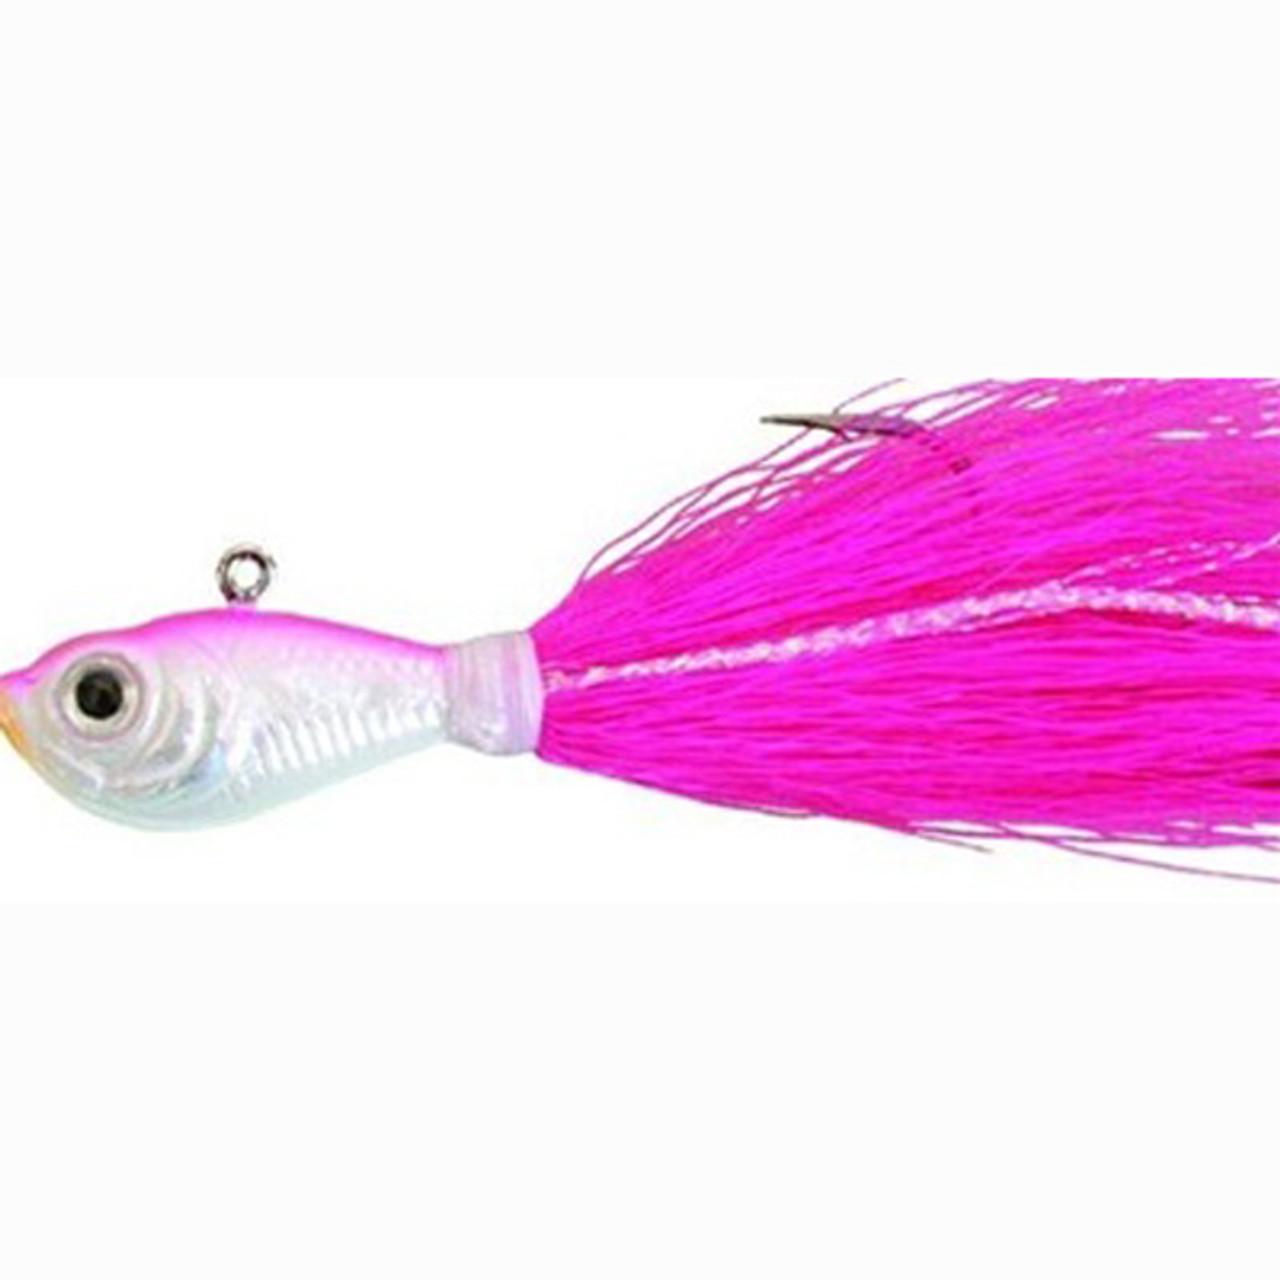 Spro Buck Tail Jig 3oz Pink